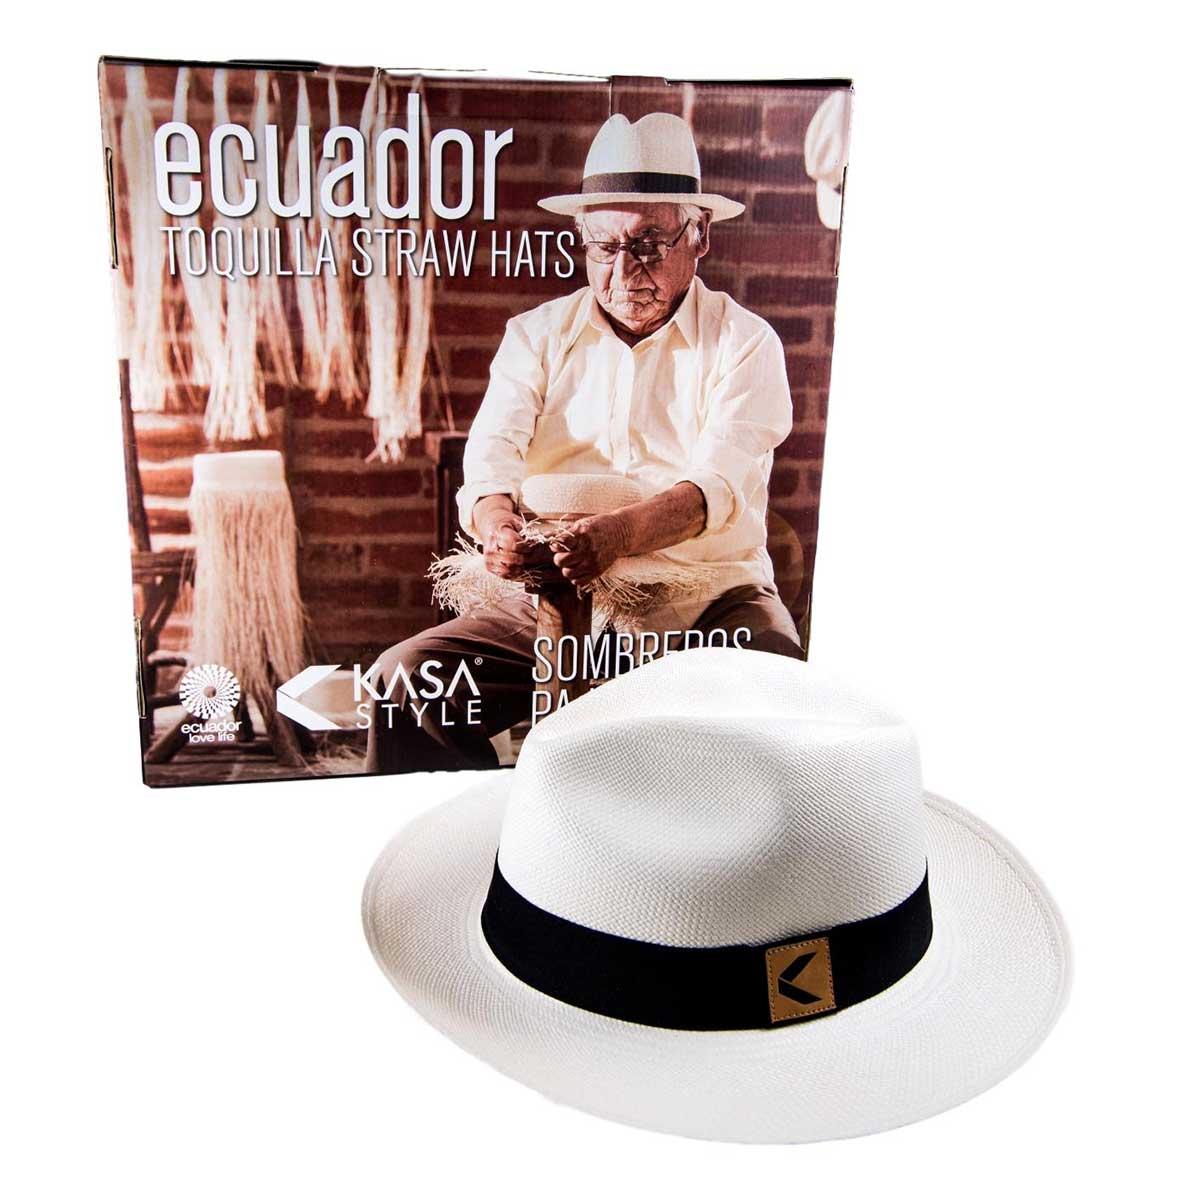 Handwoven in Ecuador Genuine Panama Hat made from Toquilla Straw White Teardrop Fedora Panama Hat